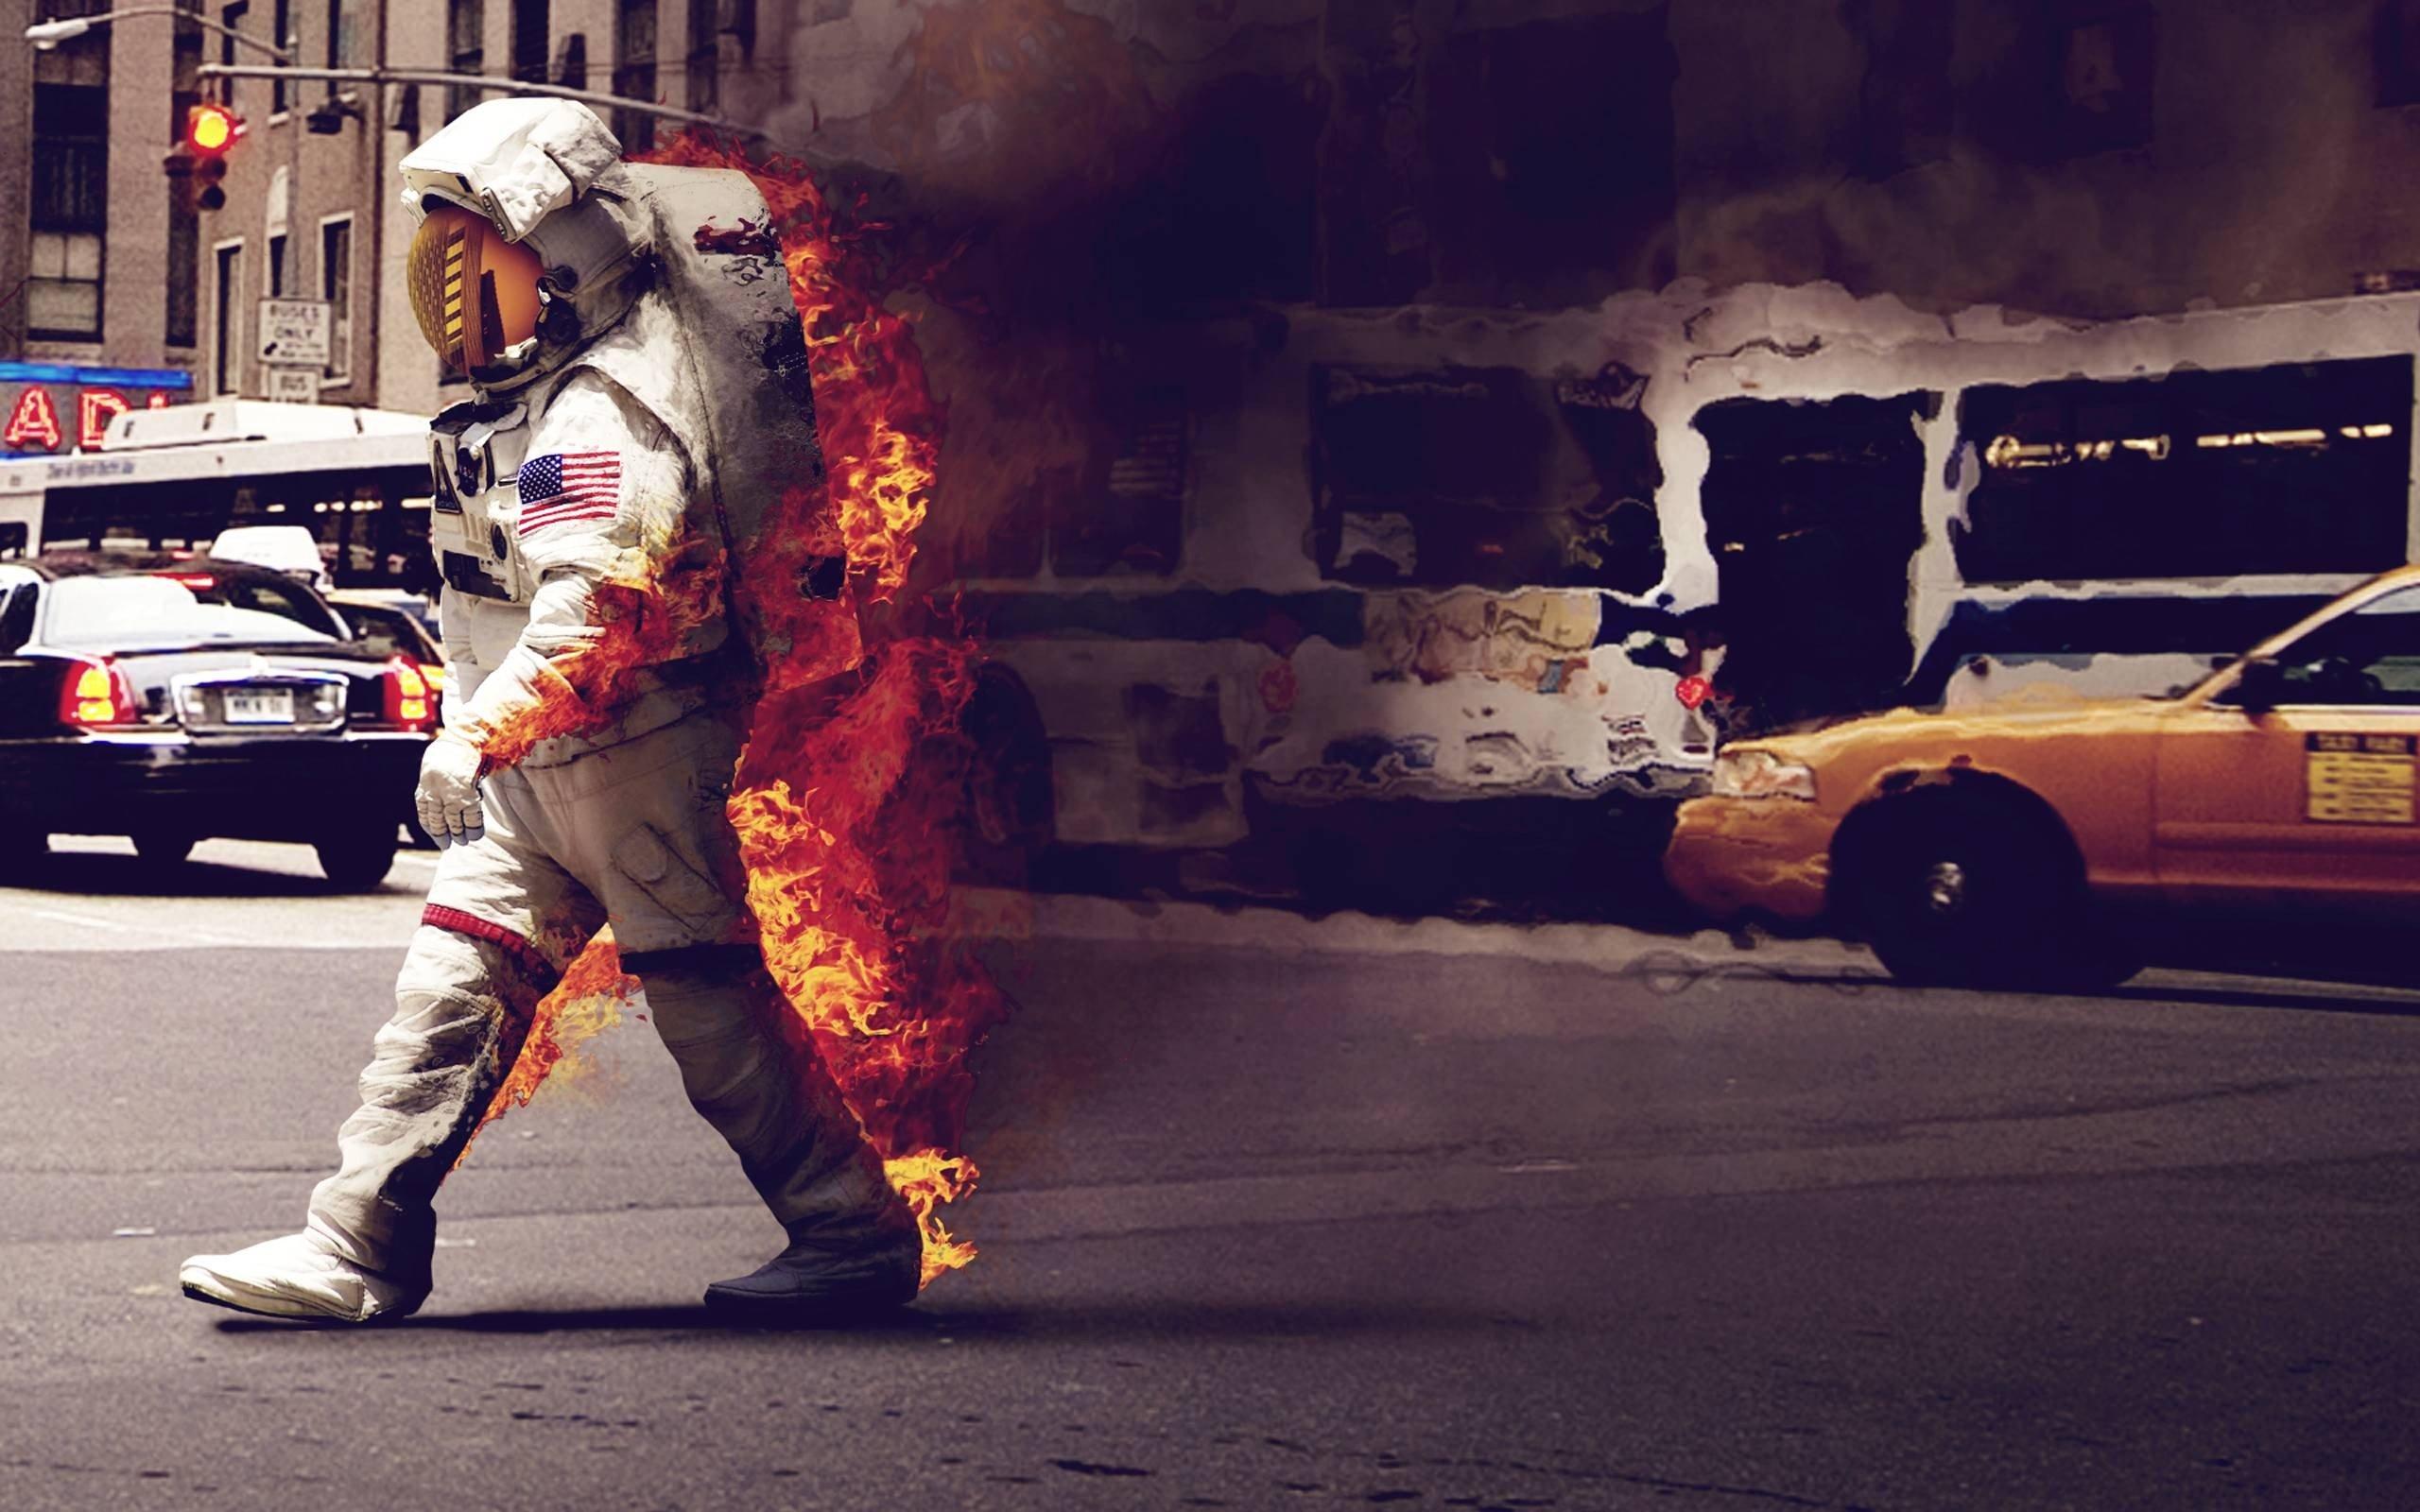 space suit, Jack Crossing, Astronaut, Street, NASA, Space ...